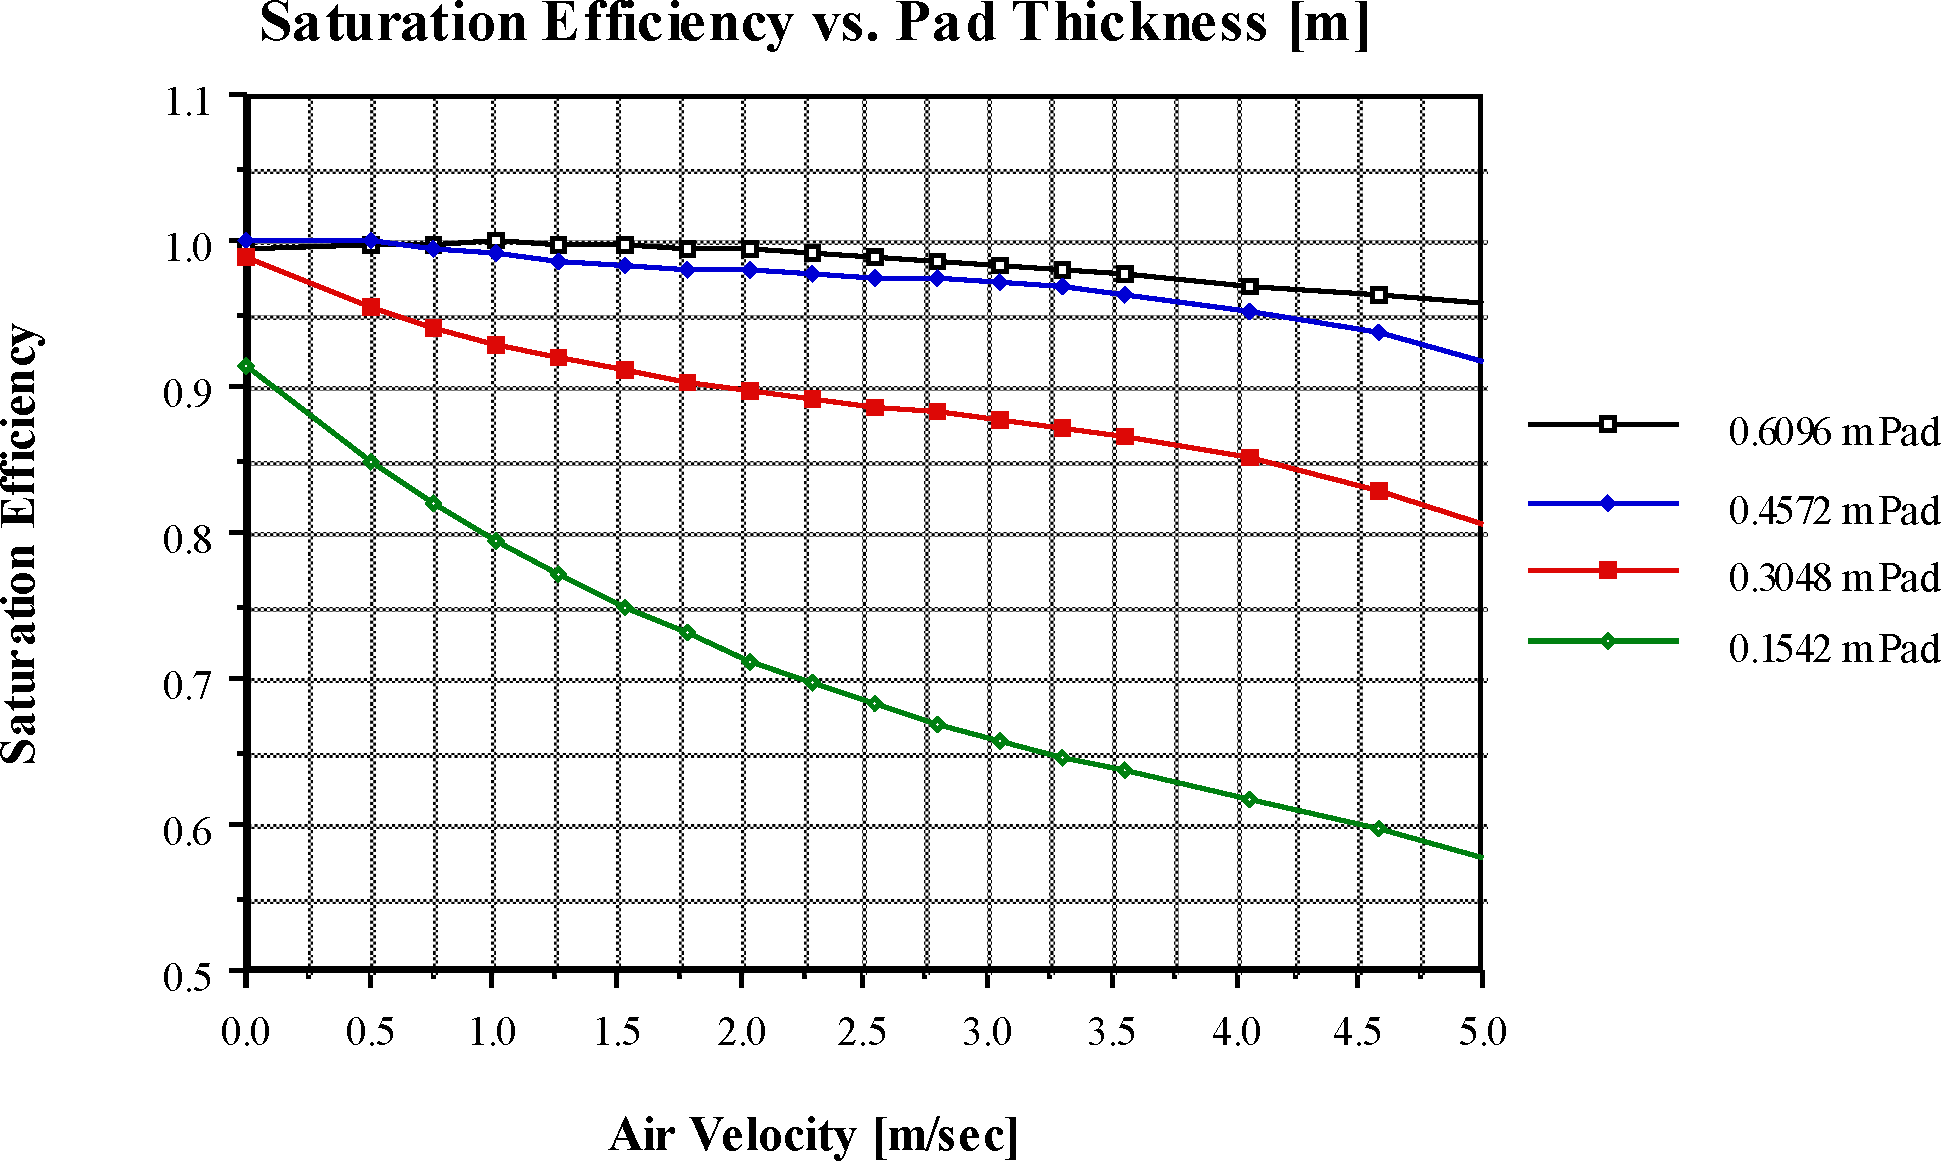 Evaporative Cooler Efficiency Chart : Evaporative coolers engineering reference — energyplus